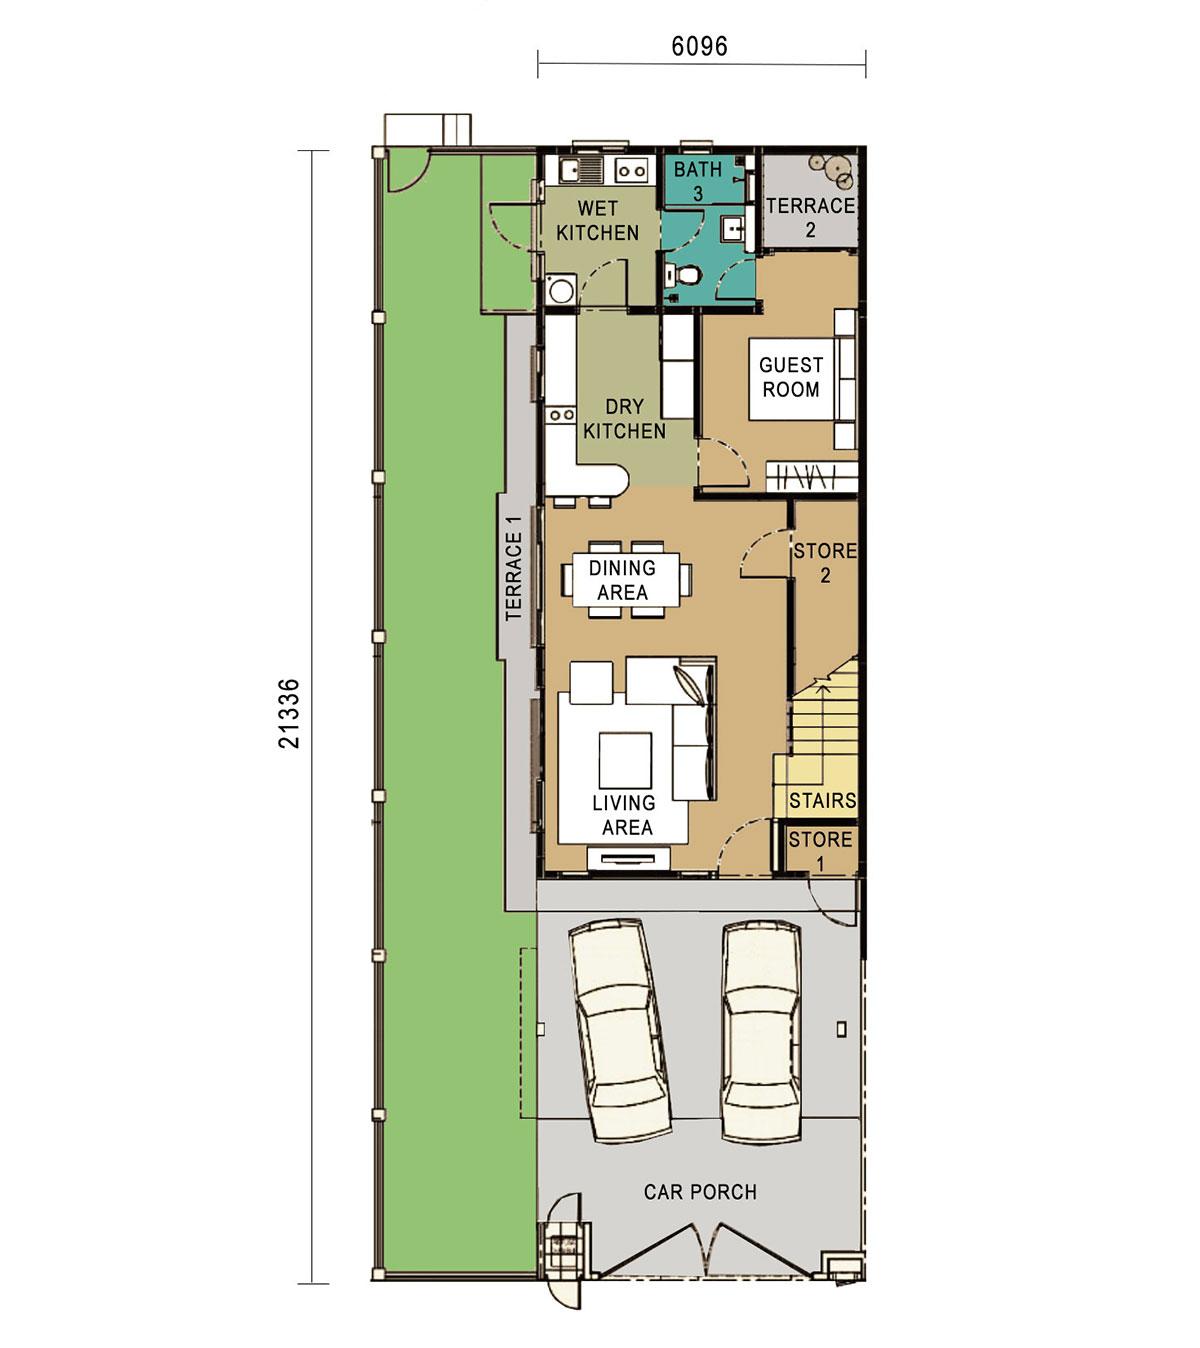 2-Storey Link Home - End Unit -Ground Floor